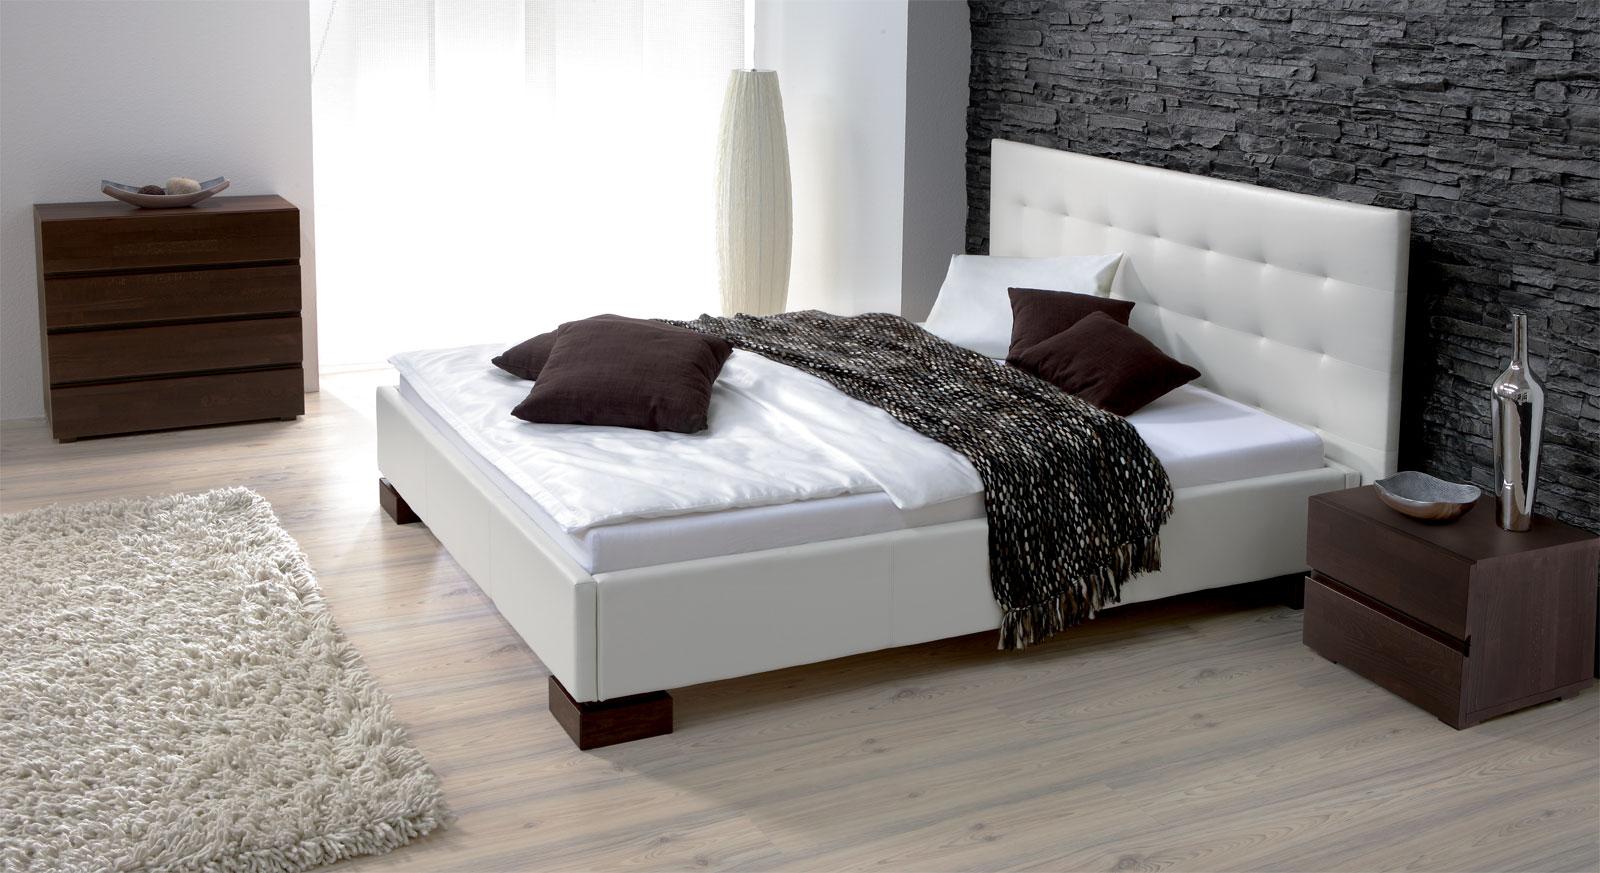 Kunstleder Bett in Überlänge erhältlich - Bett Ruby